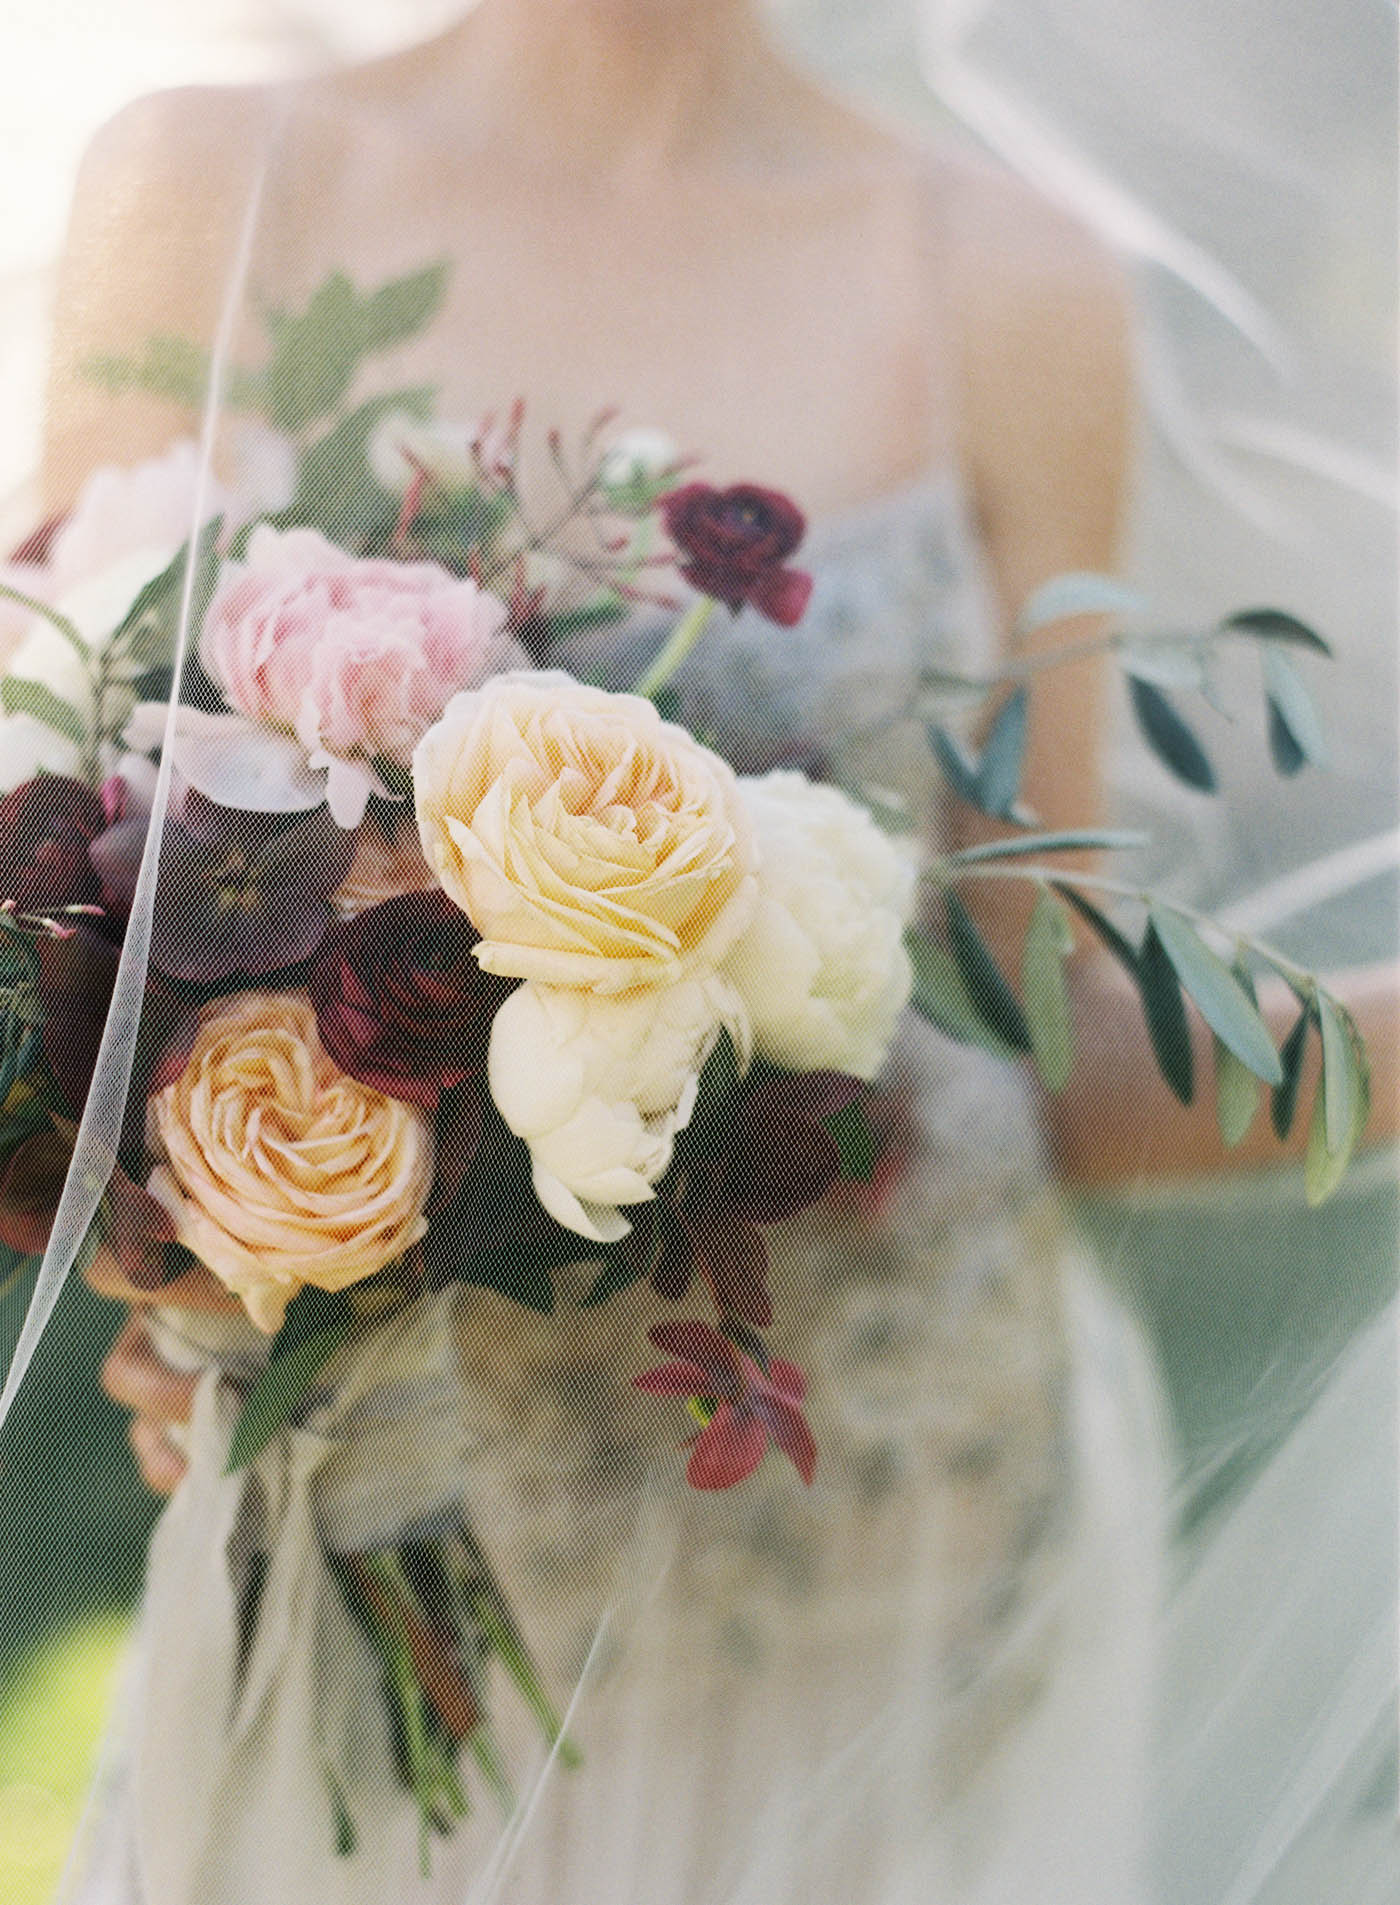 Villa_Cetinale_Wedding-38-Jen_Huang-ElanJacob-246-Jen_Huang-007305-R1-004.jpg